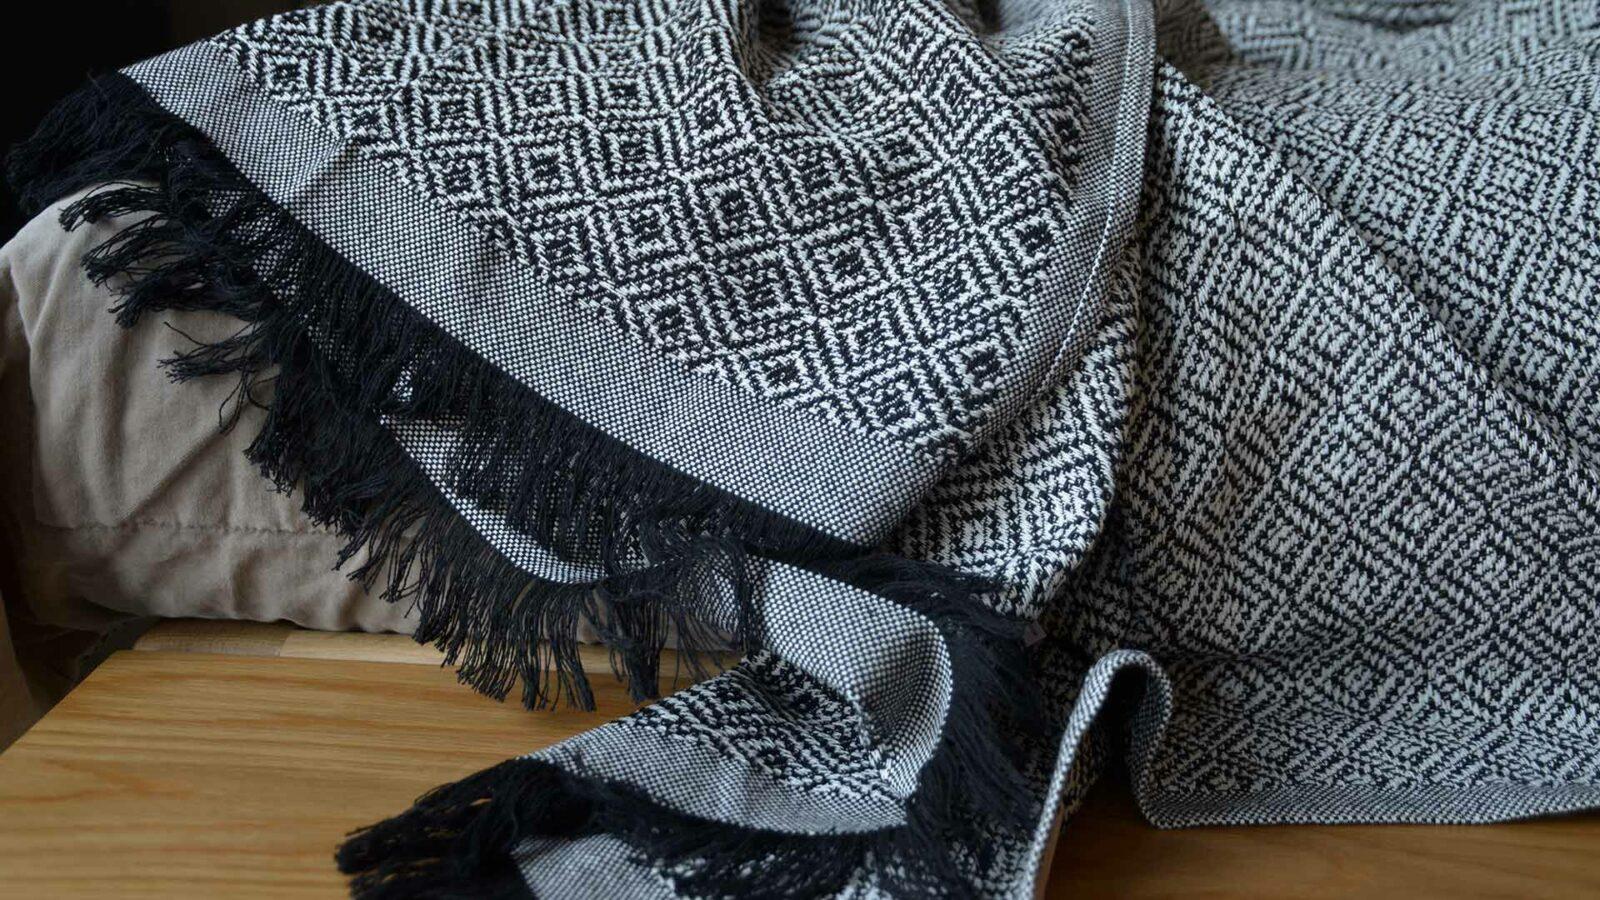 cotton rich woven design black and white throw